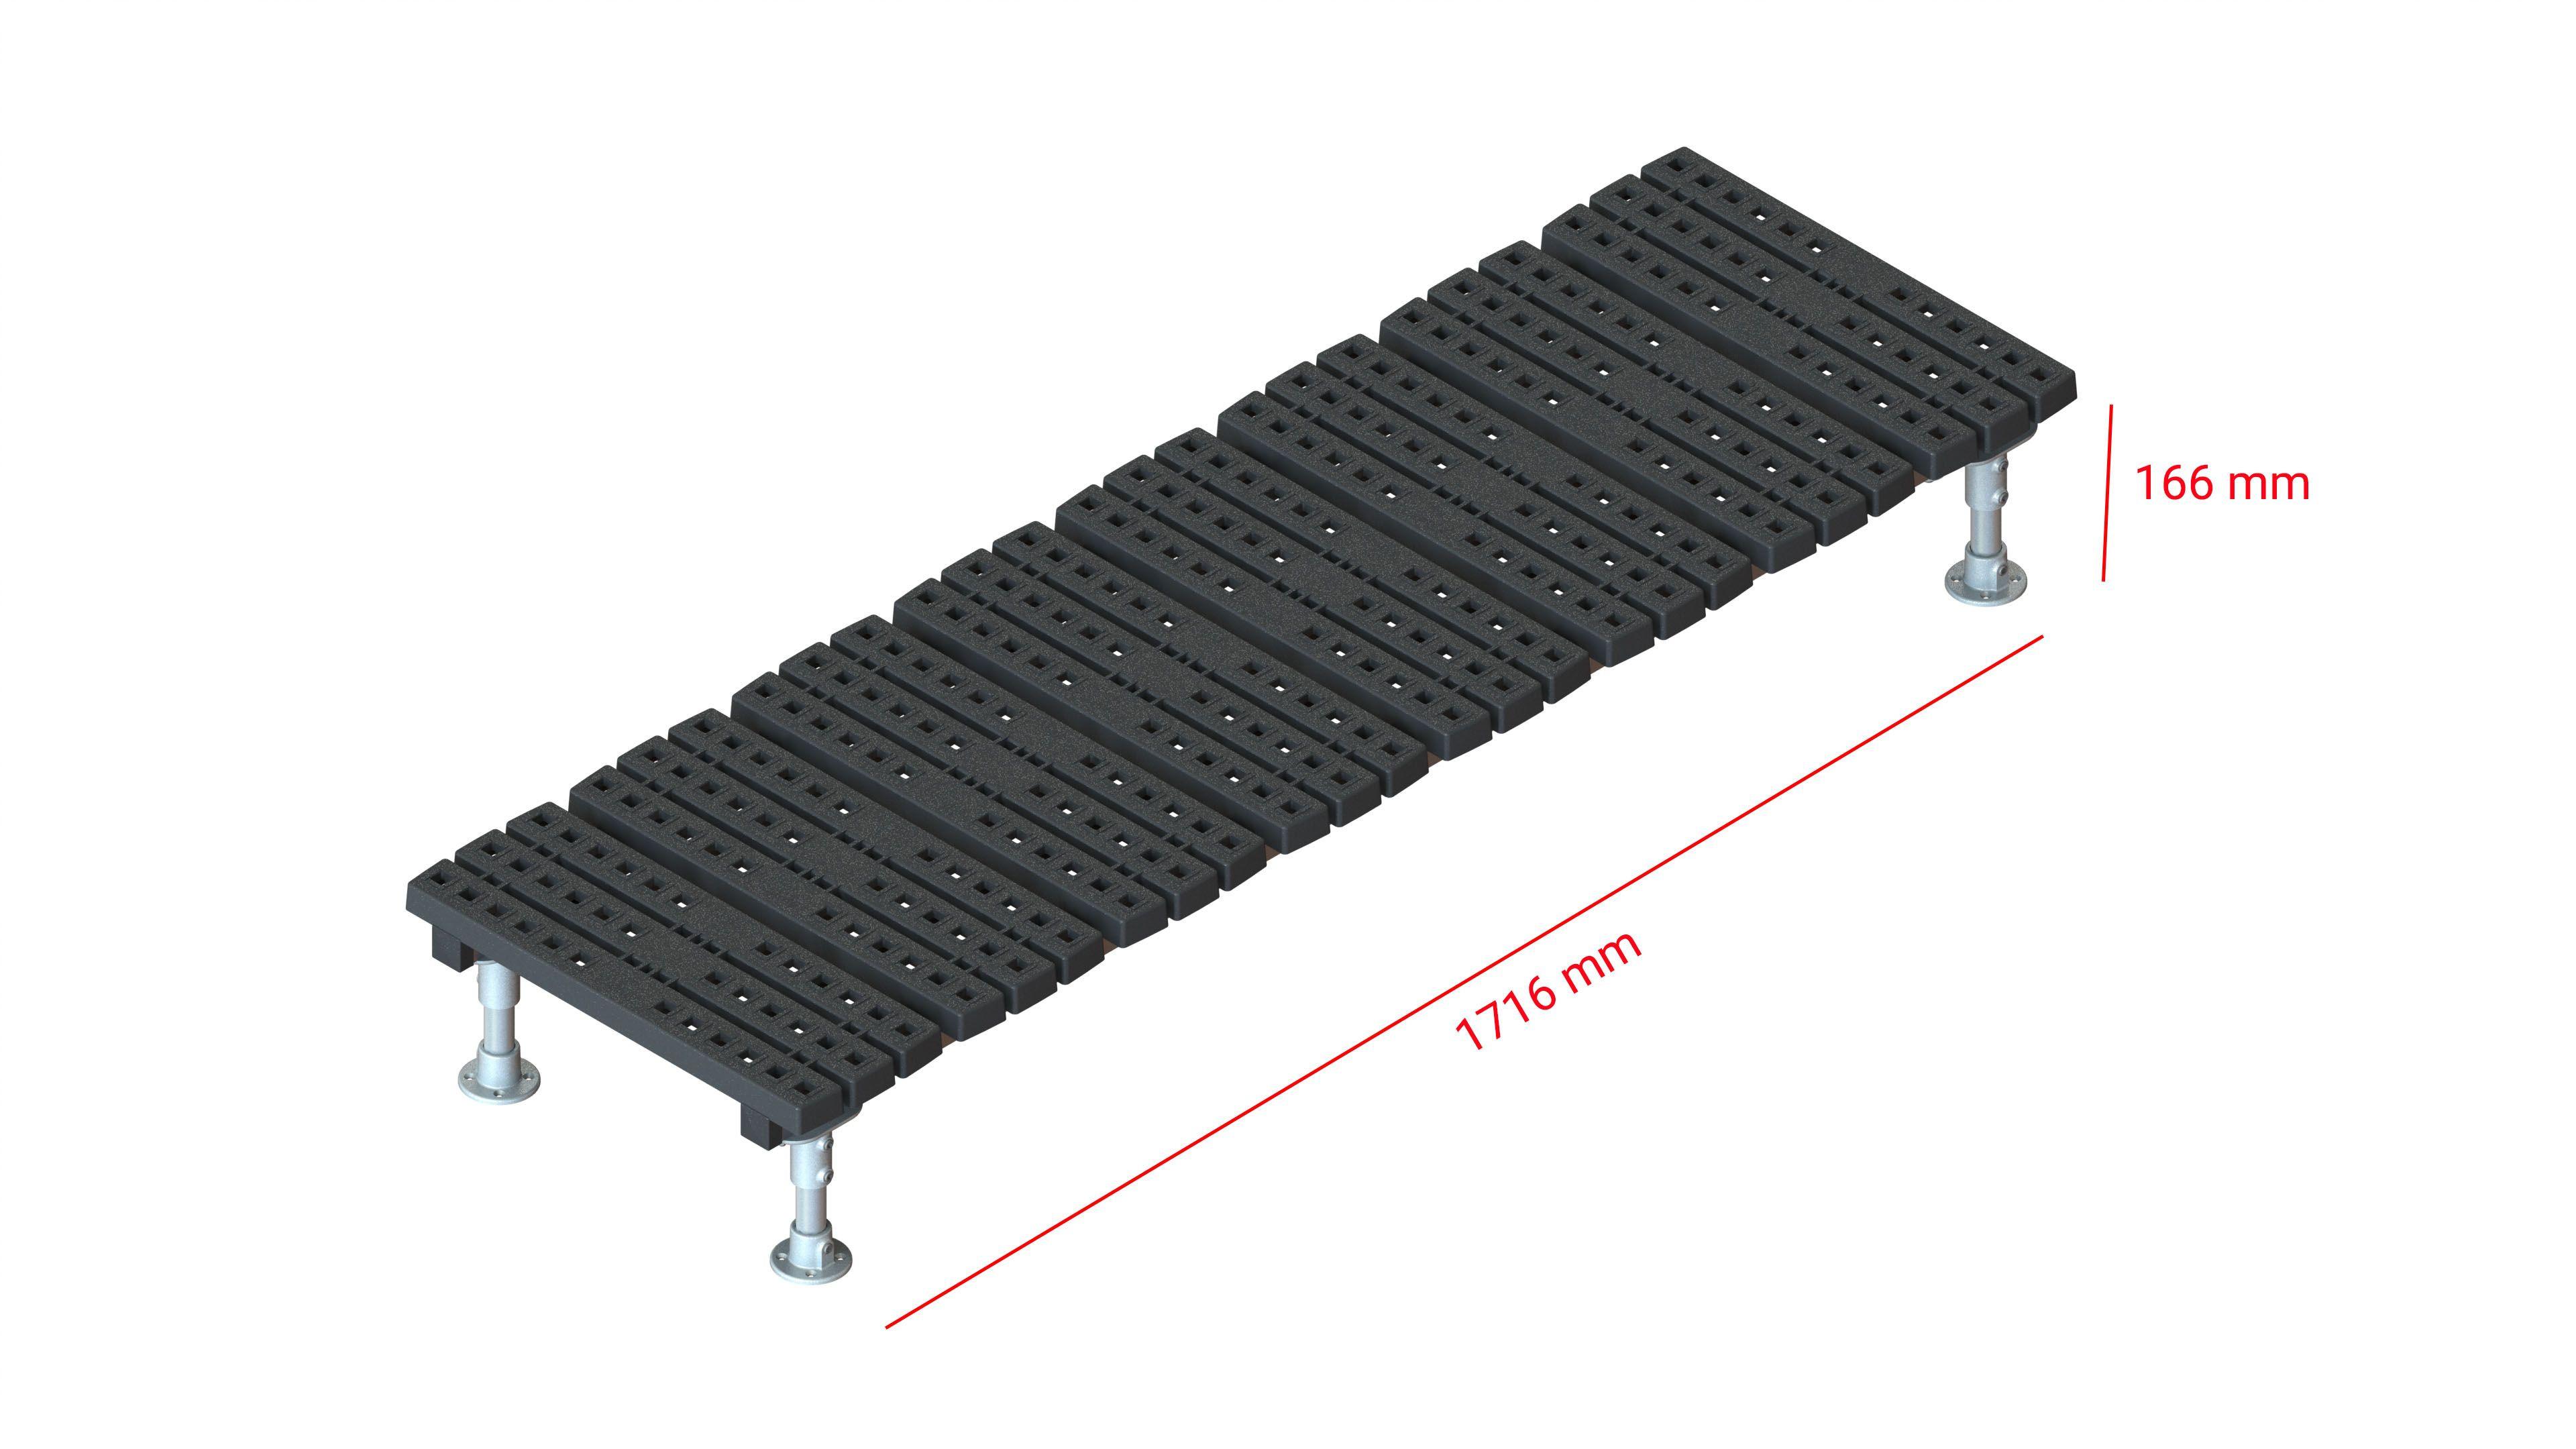 Mini step-over platform - Fixed, 166x1716mm clearance